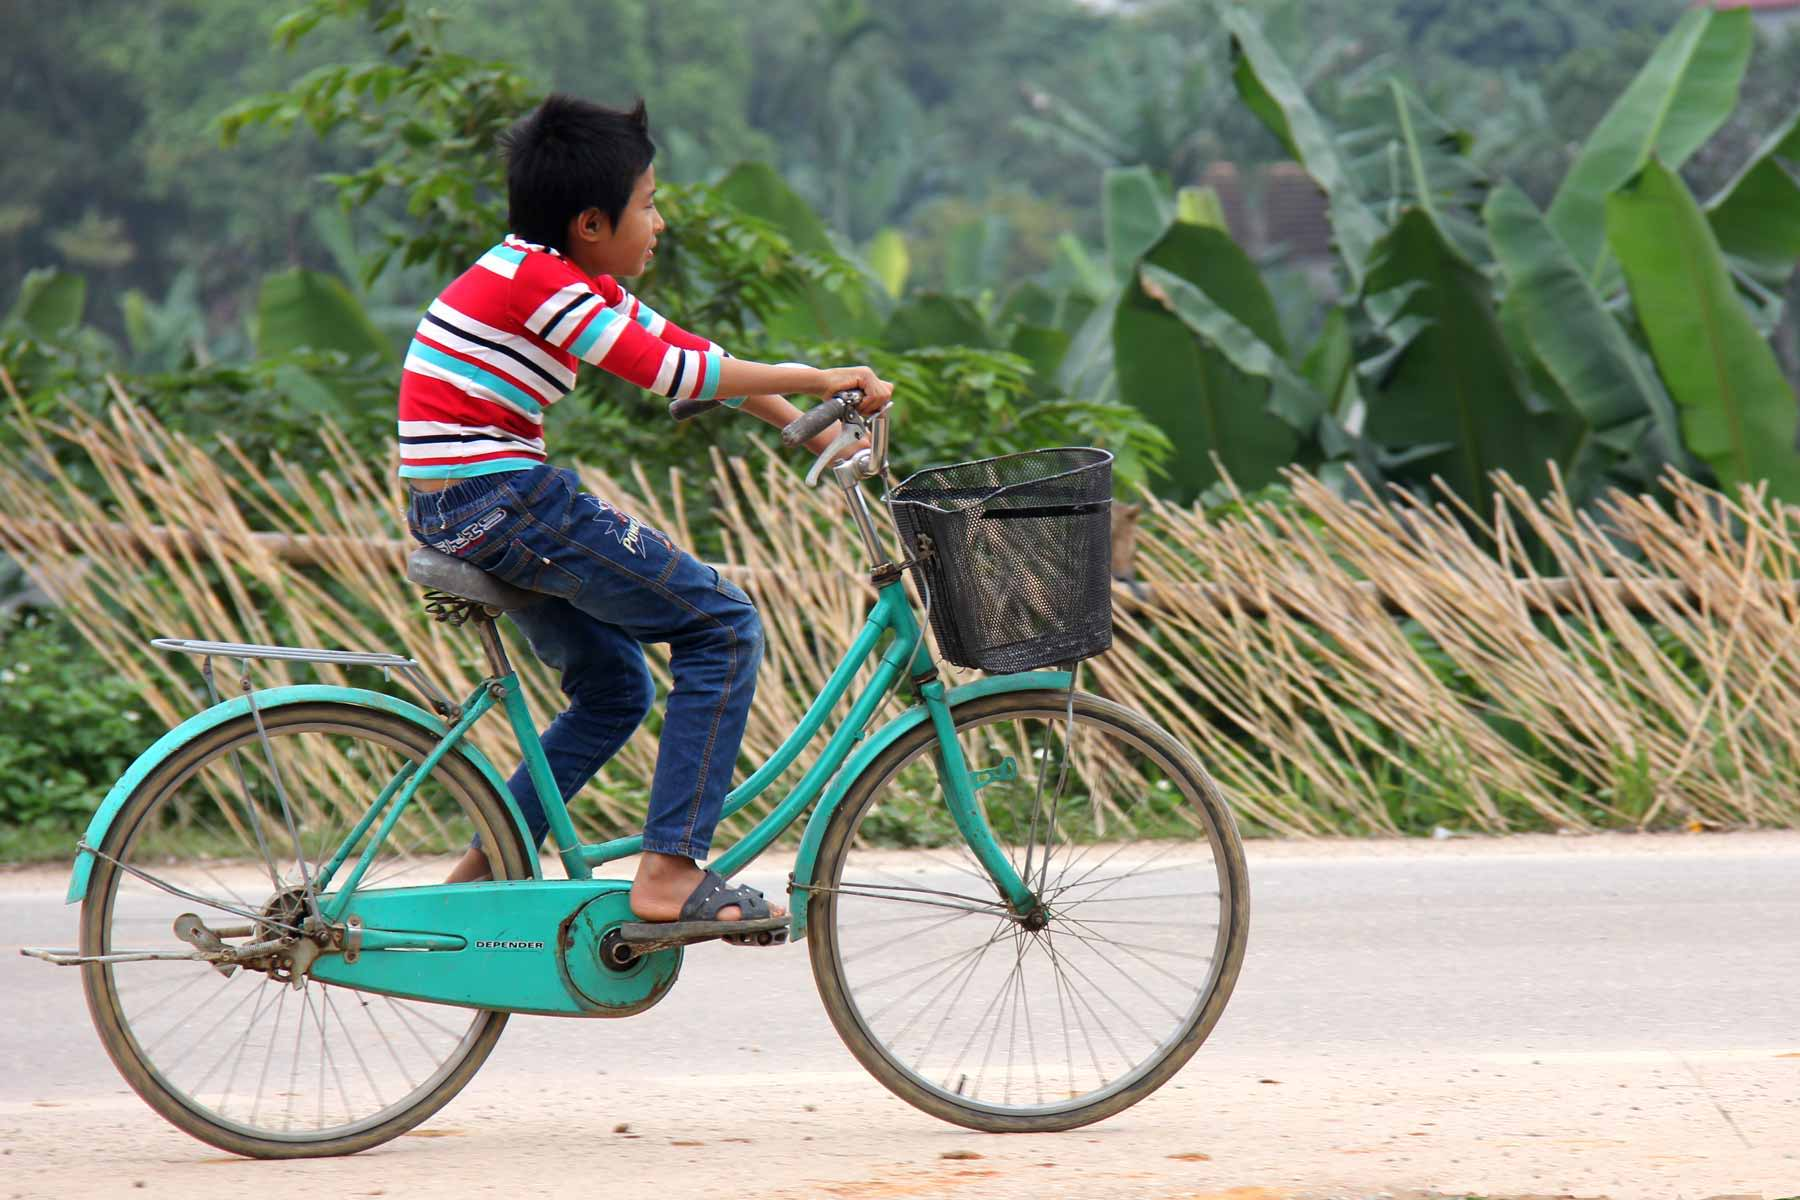 Vietnamese child riding his bike past bamboo stalks